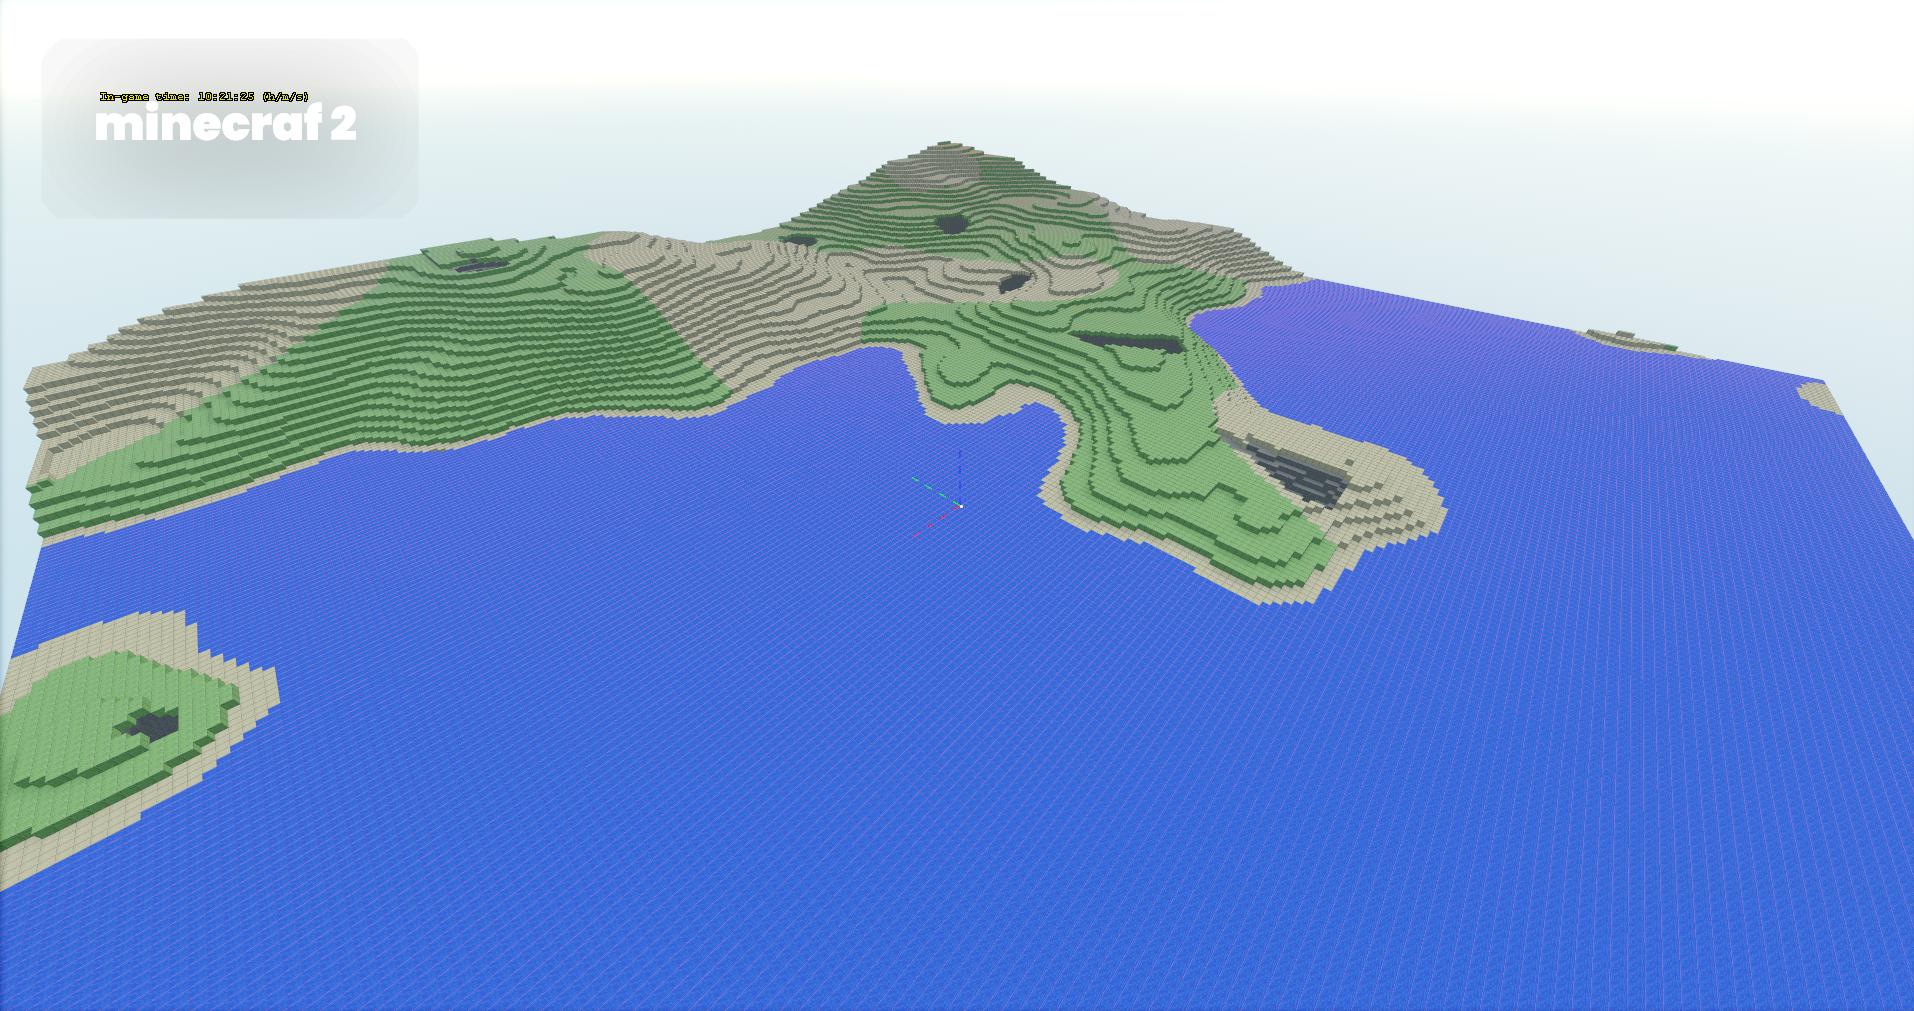 boring terrain